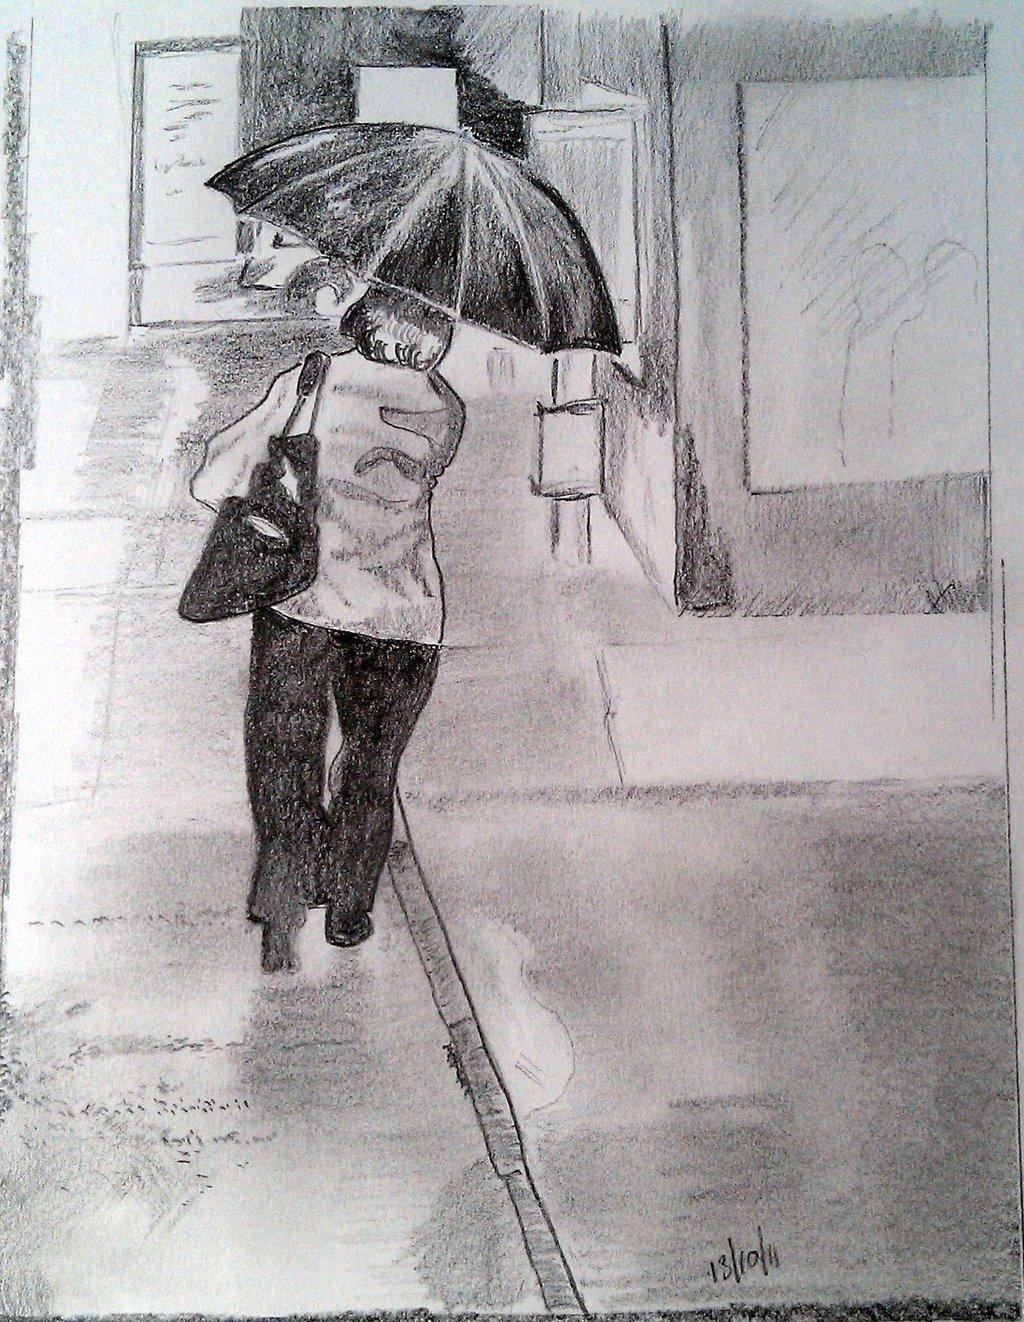 Drawn rain pencil sketch 2011 by Rainy artist Crafthubs